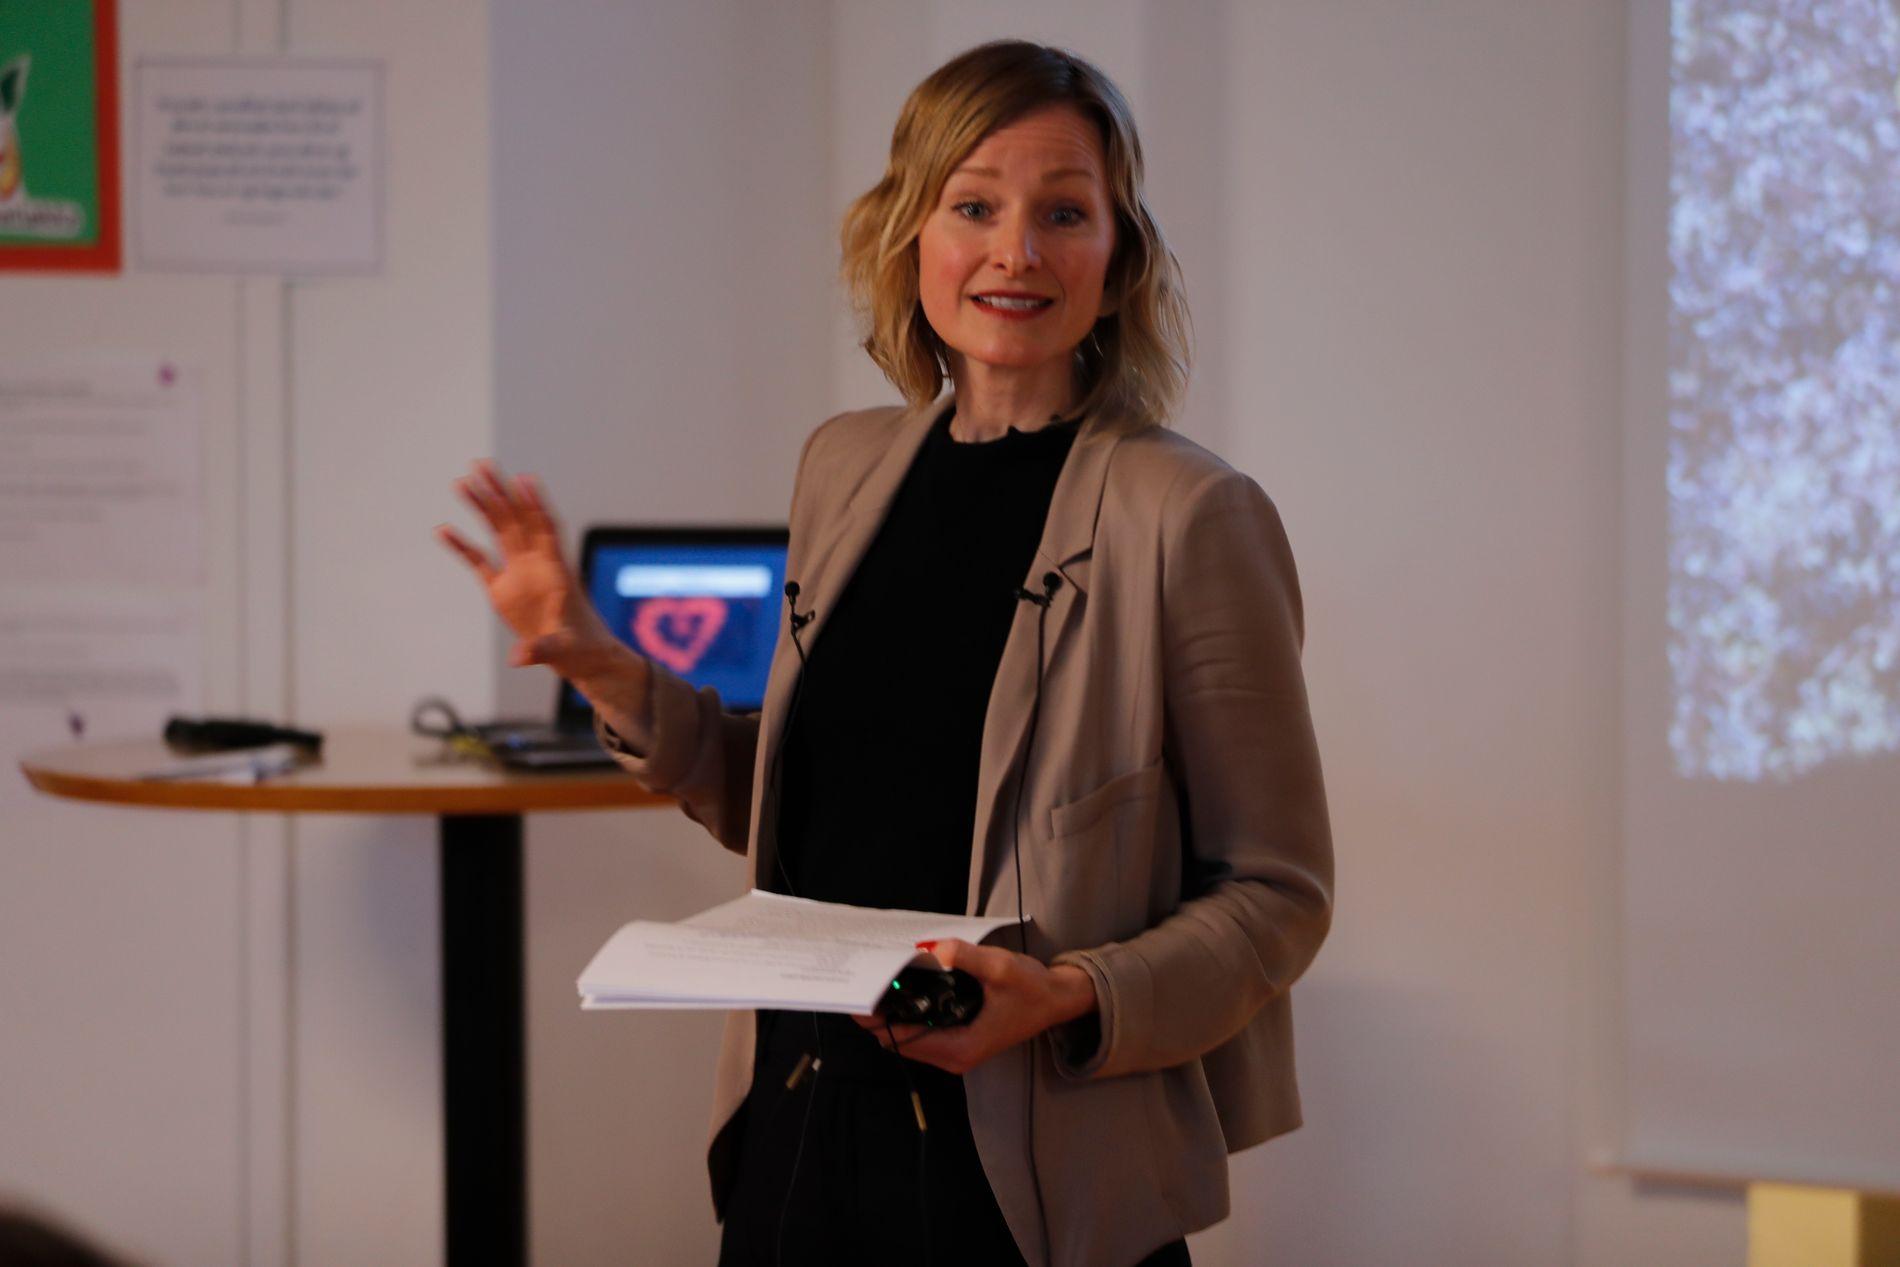 BYRÅD: Inga Marte Thorkildsen under et skolebesøk i Oslo tidigere i år.